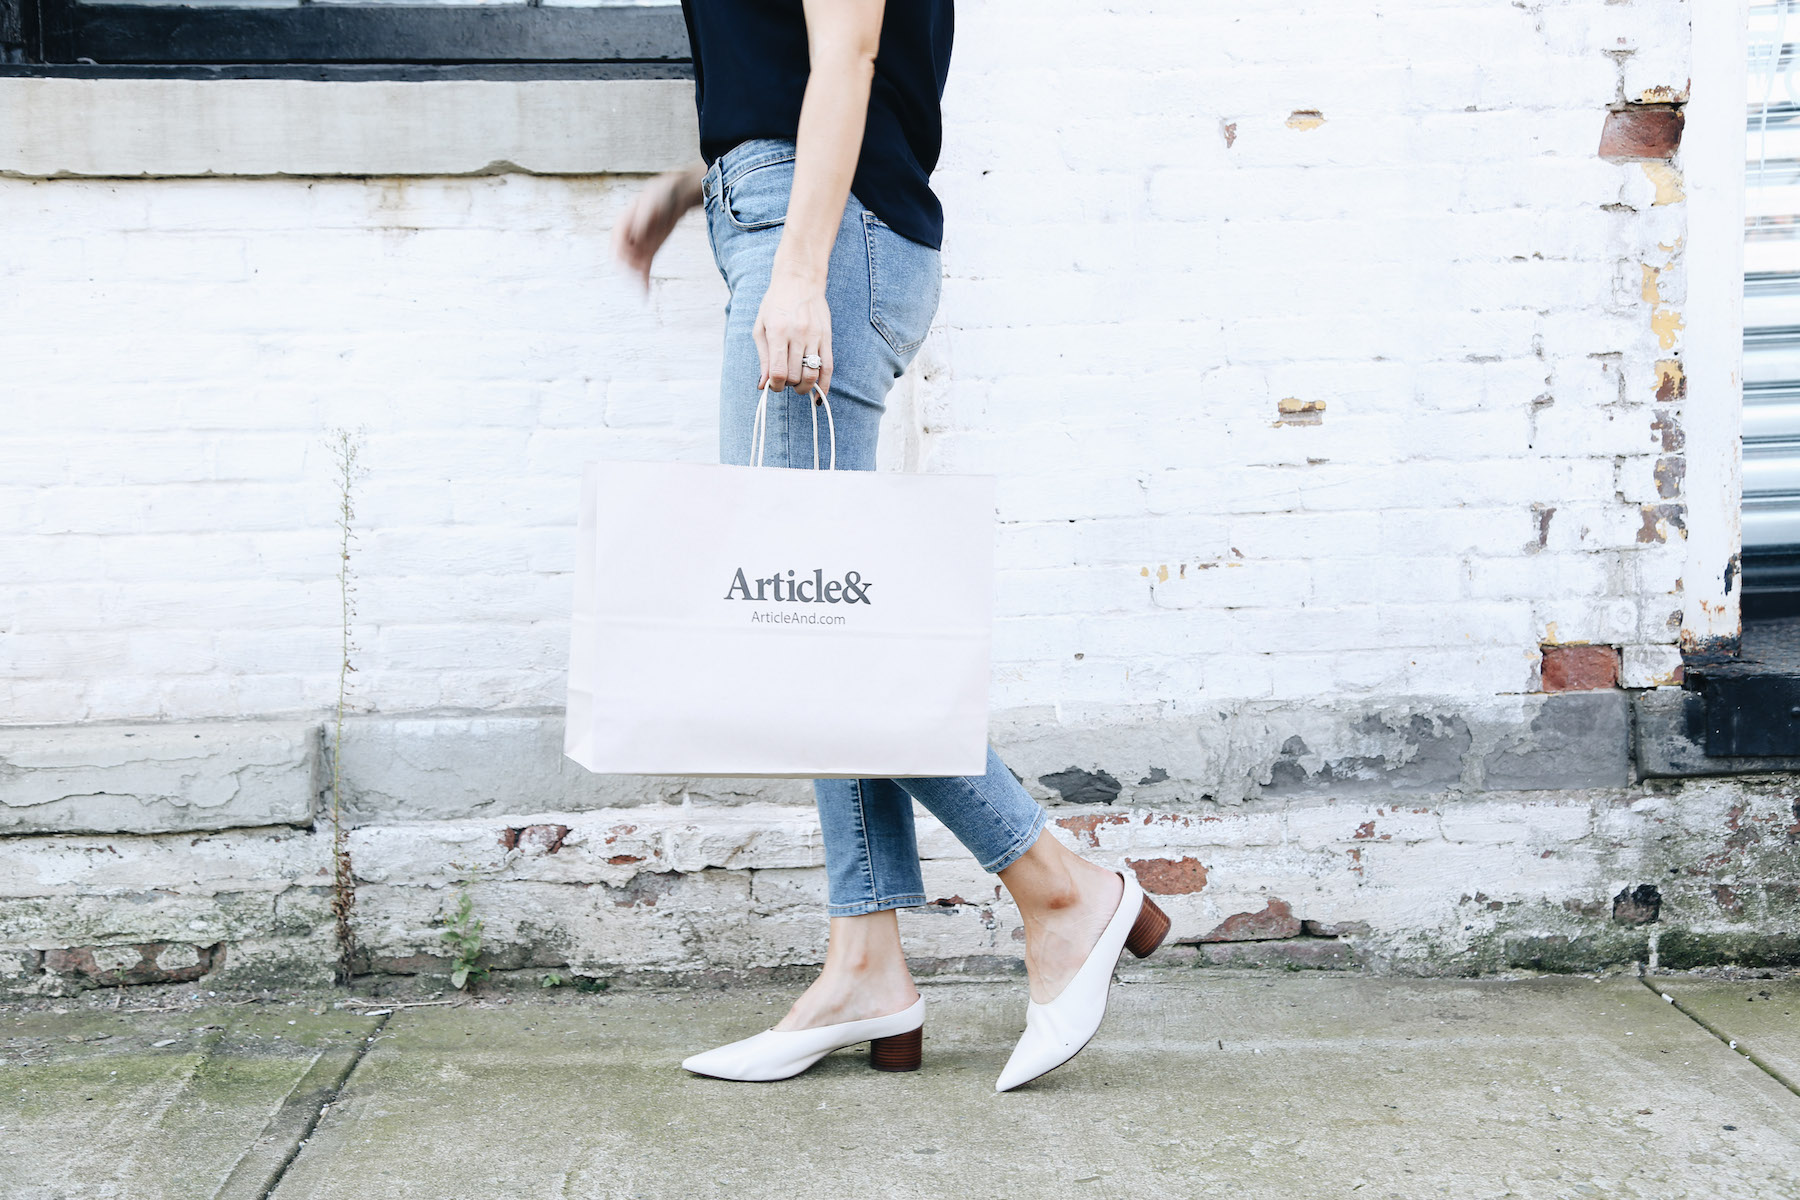 A Gem of a Brooklyn Boutique - (Article&, Cobble Hill)